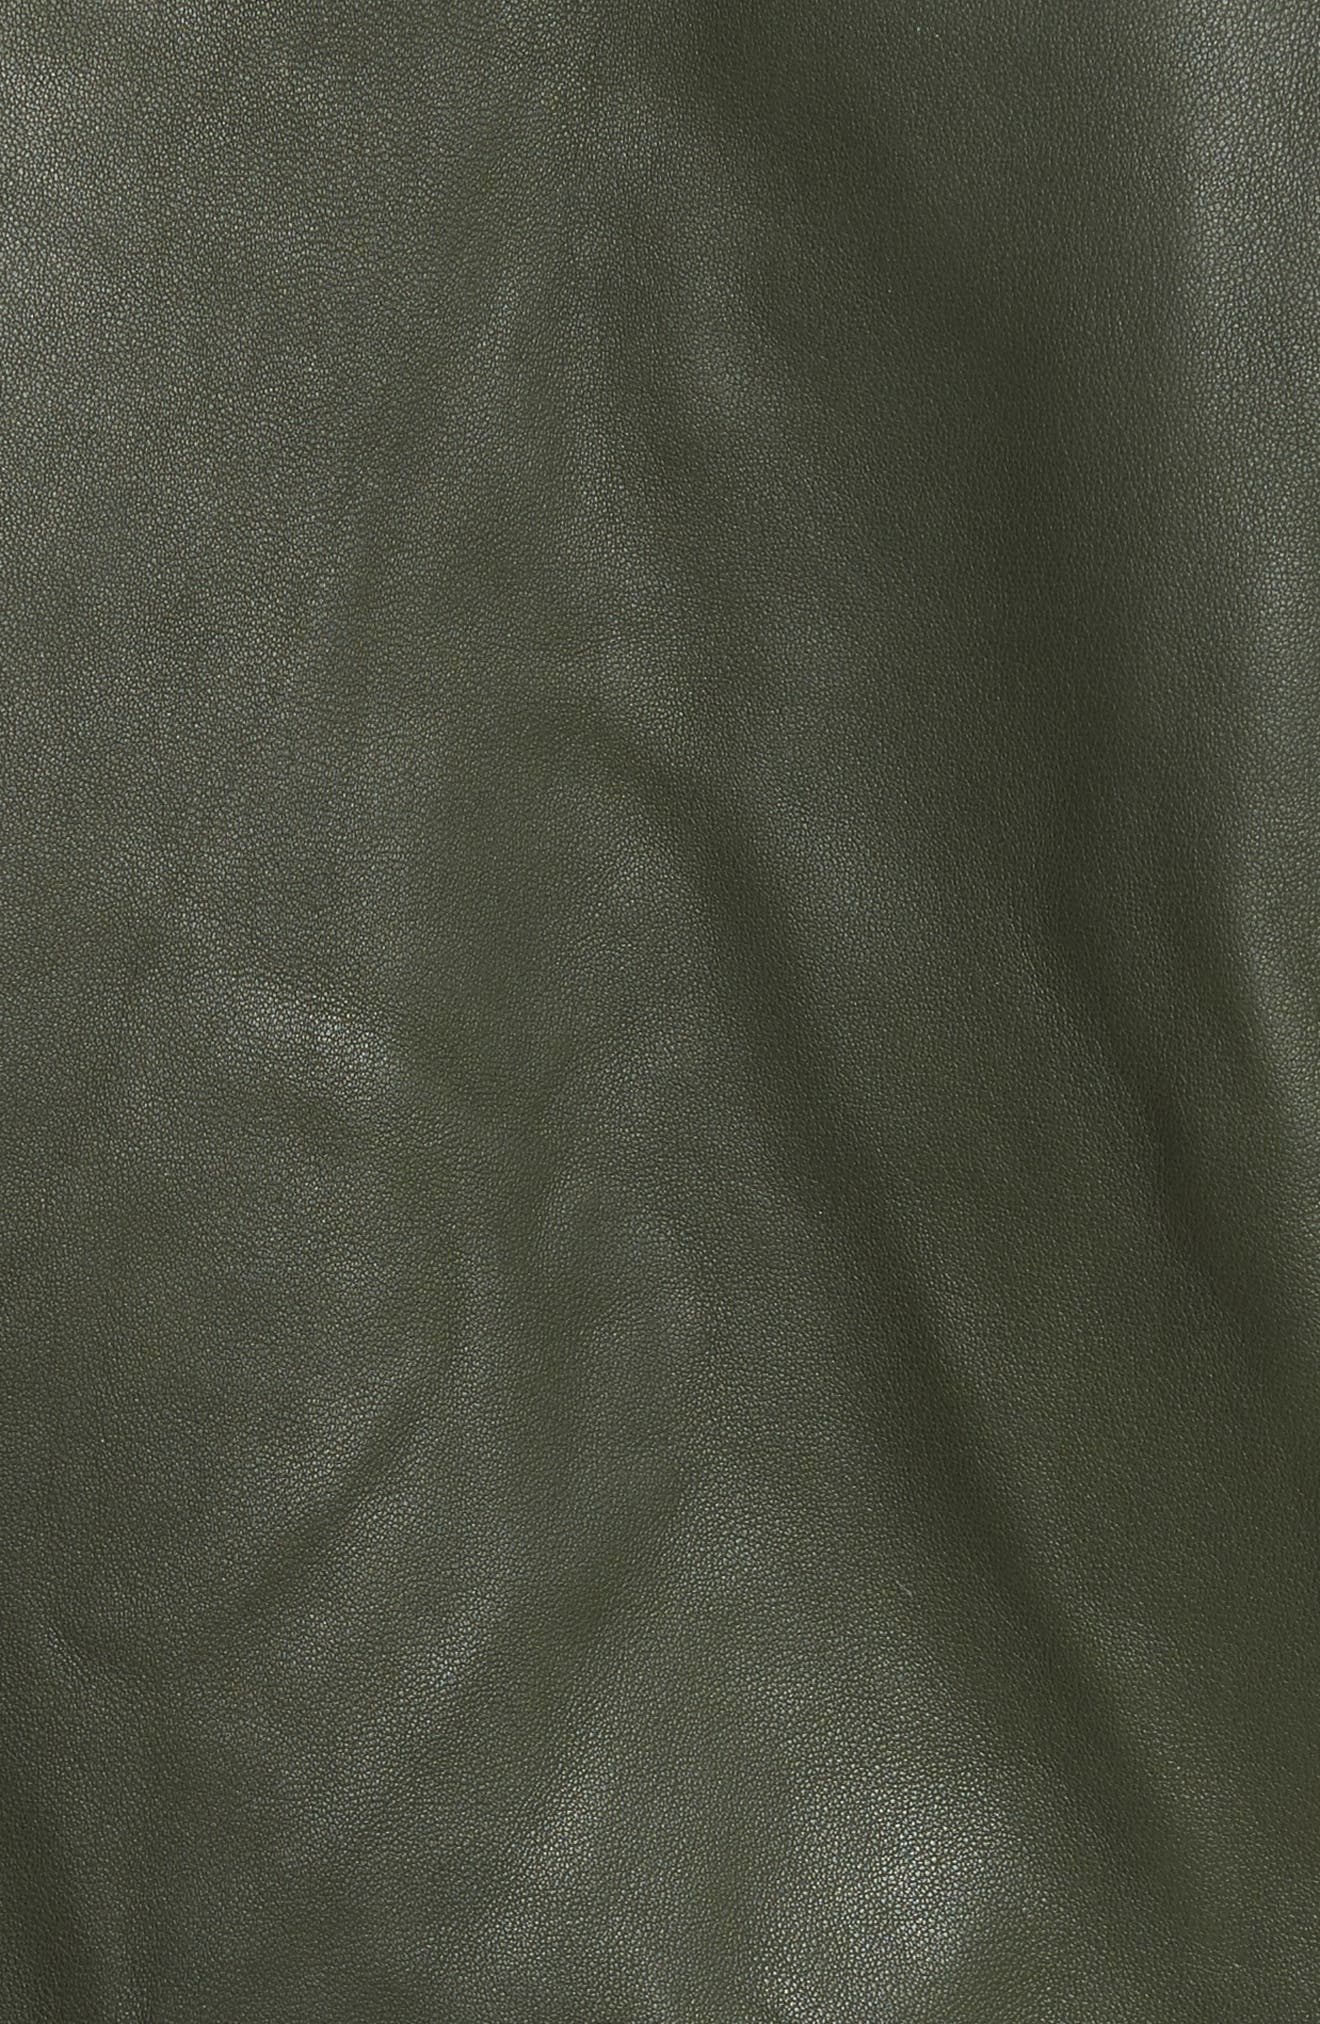 Jayne Orion Lambskin Leather Moto Jacket,                             Alternate thumbnail 5, color,                             319